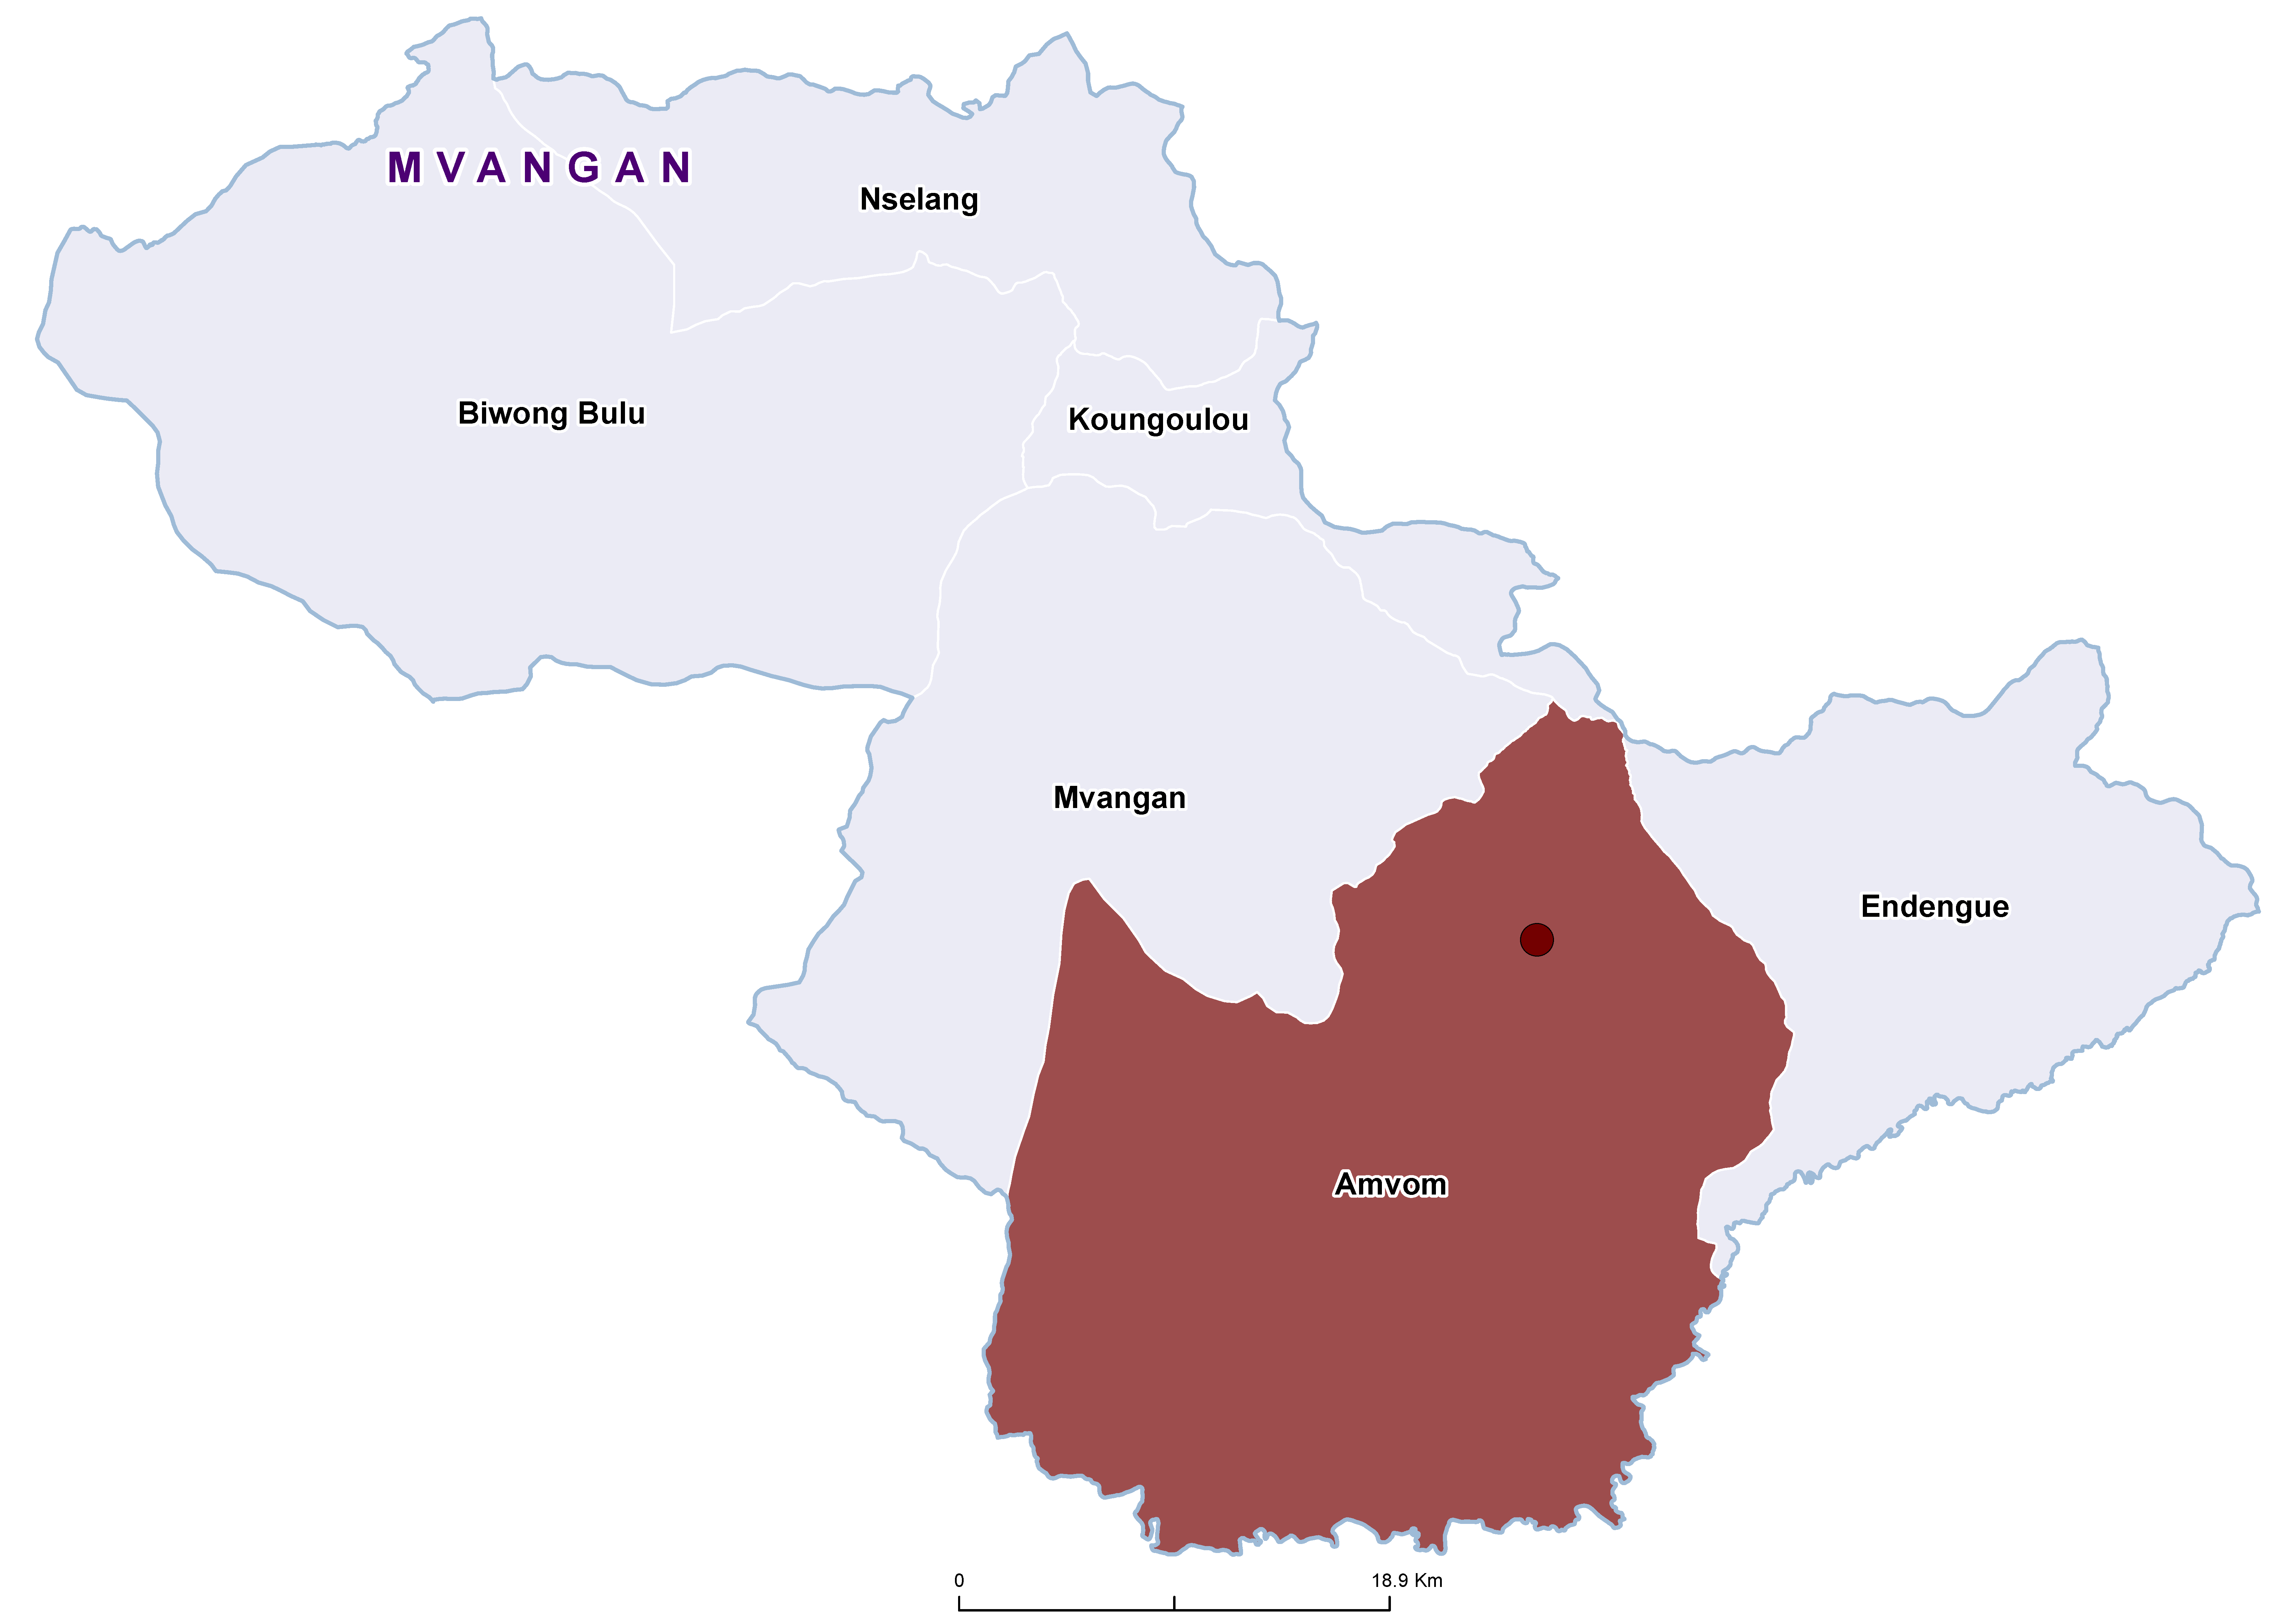 Mvangan STH 19850001